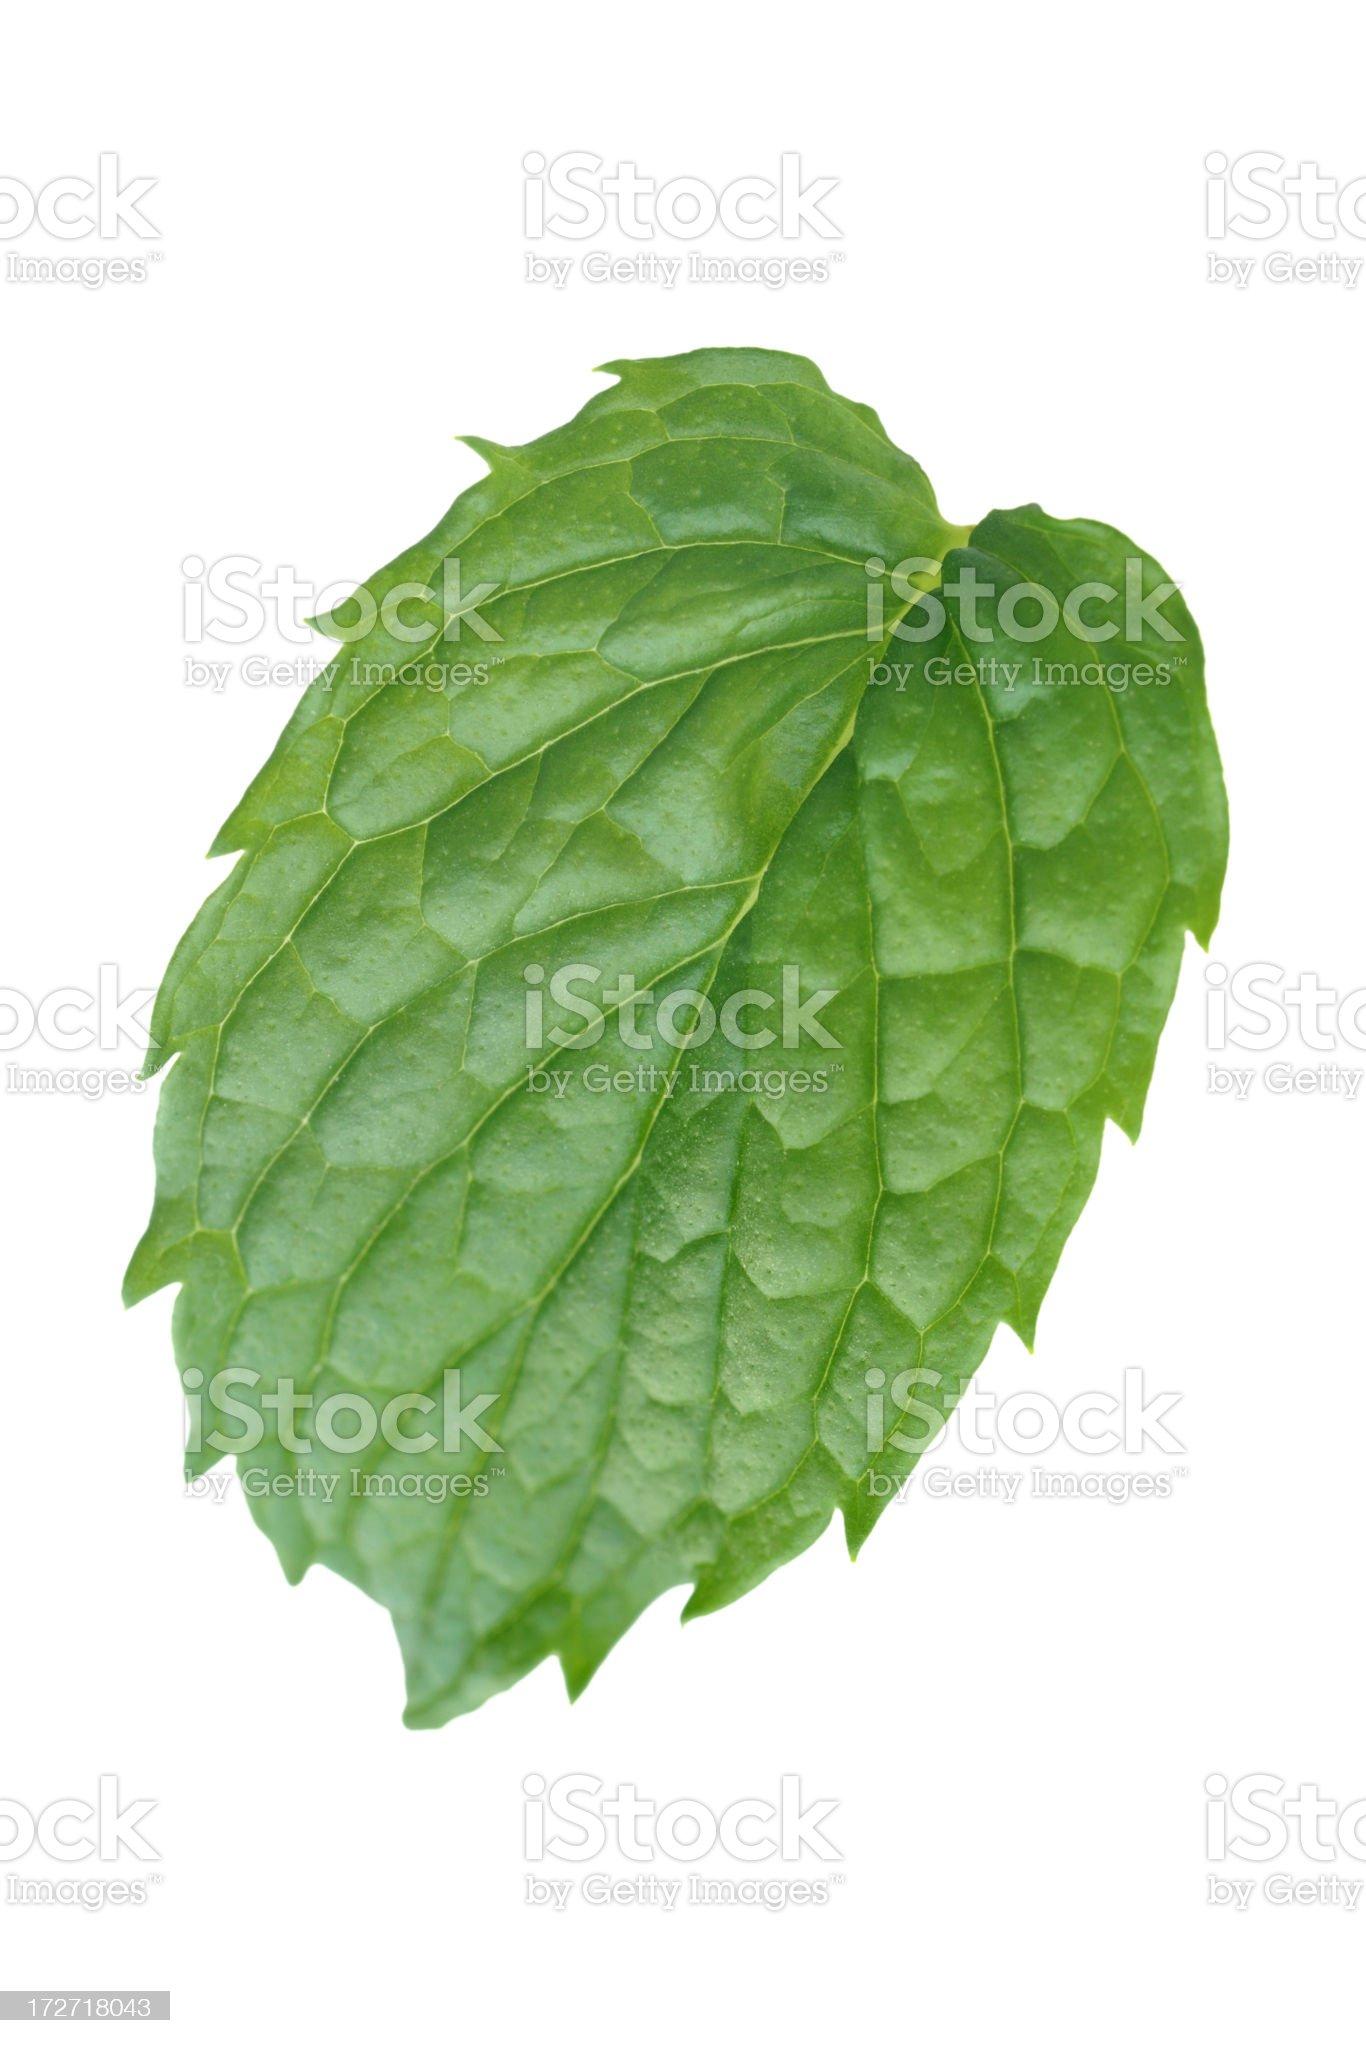 Single mint leaf royalty-free stock photo